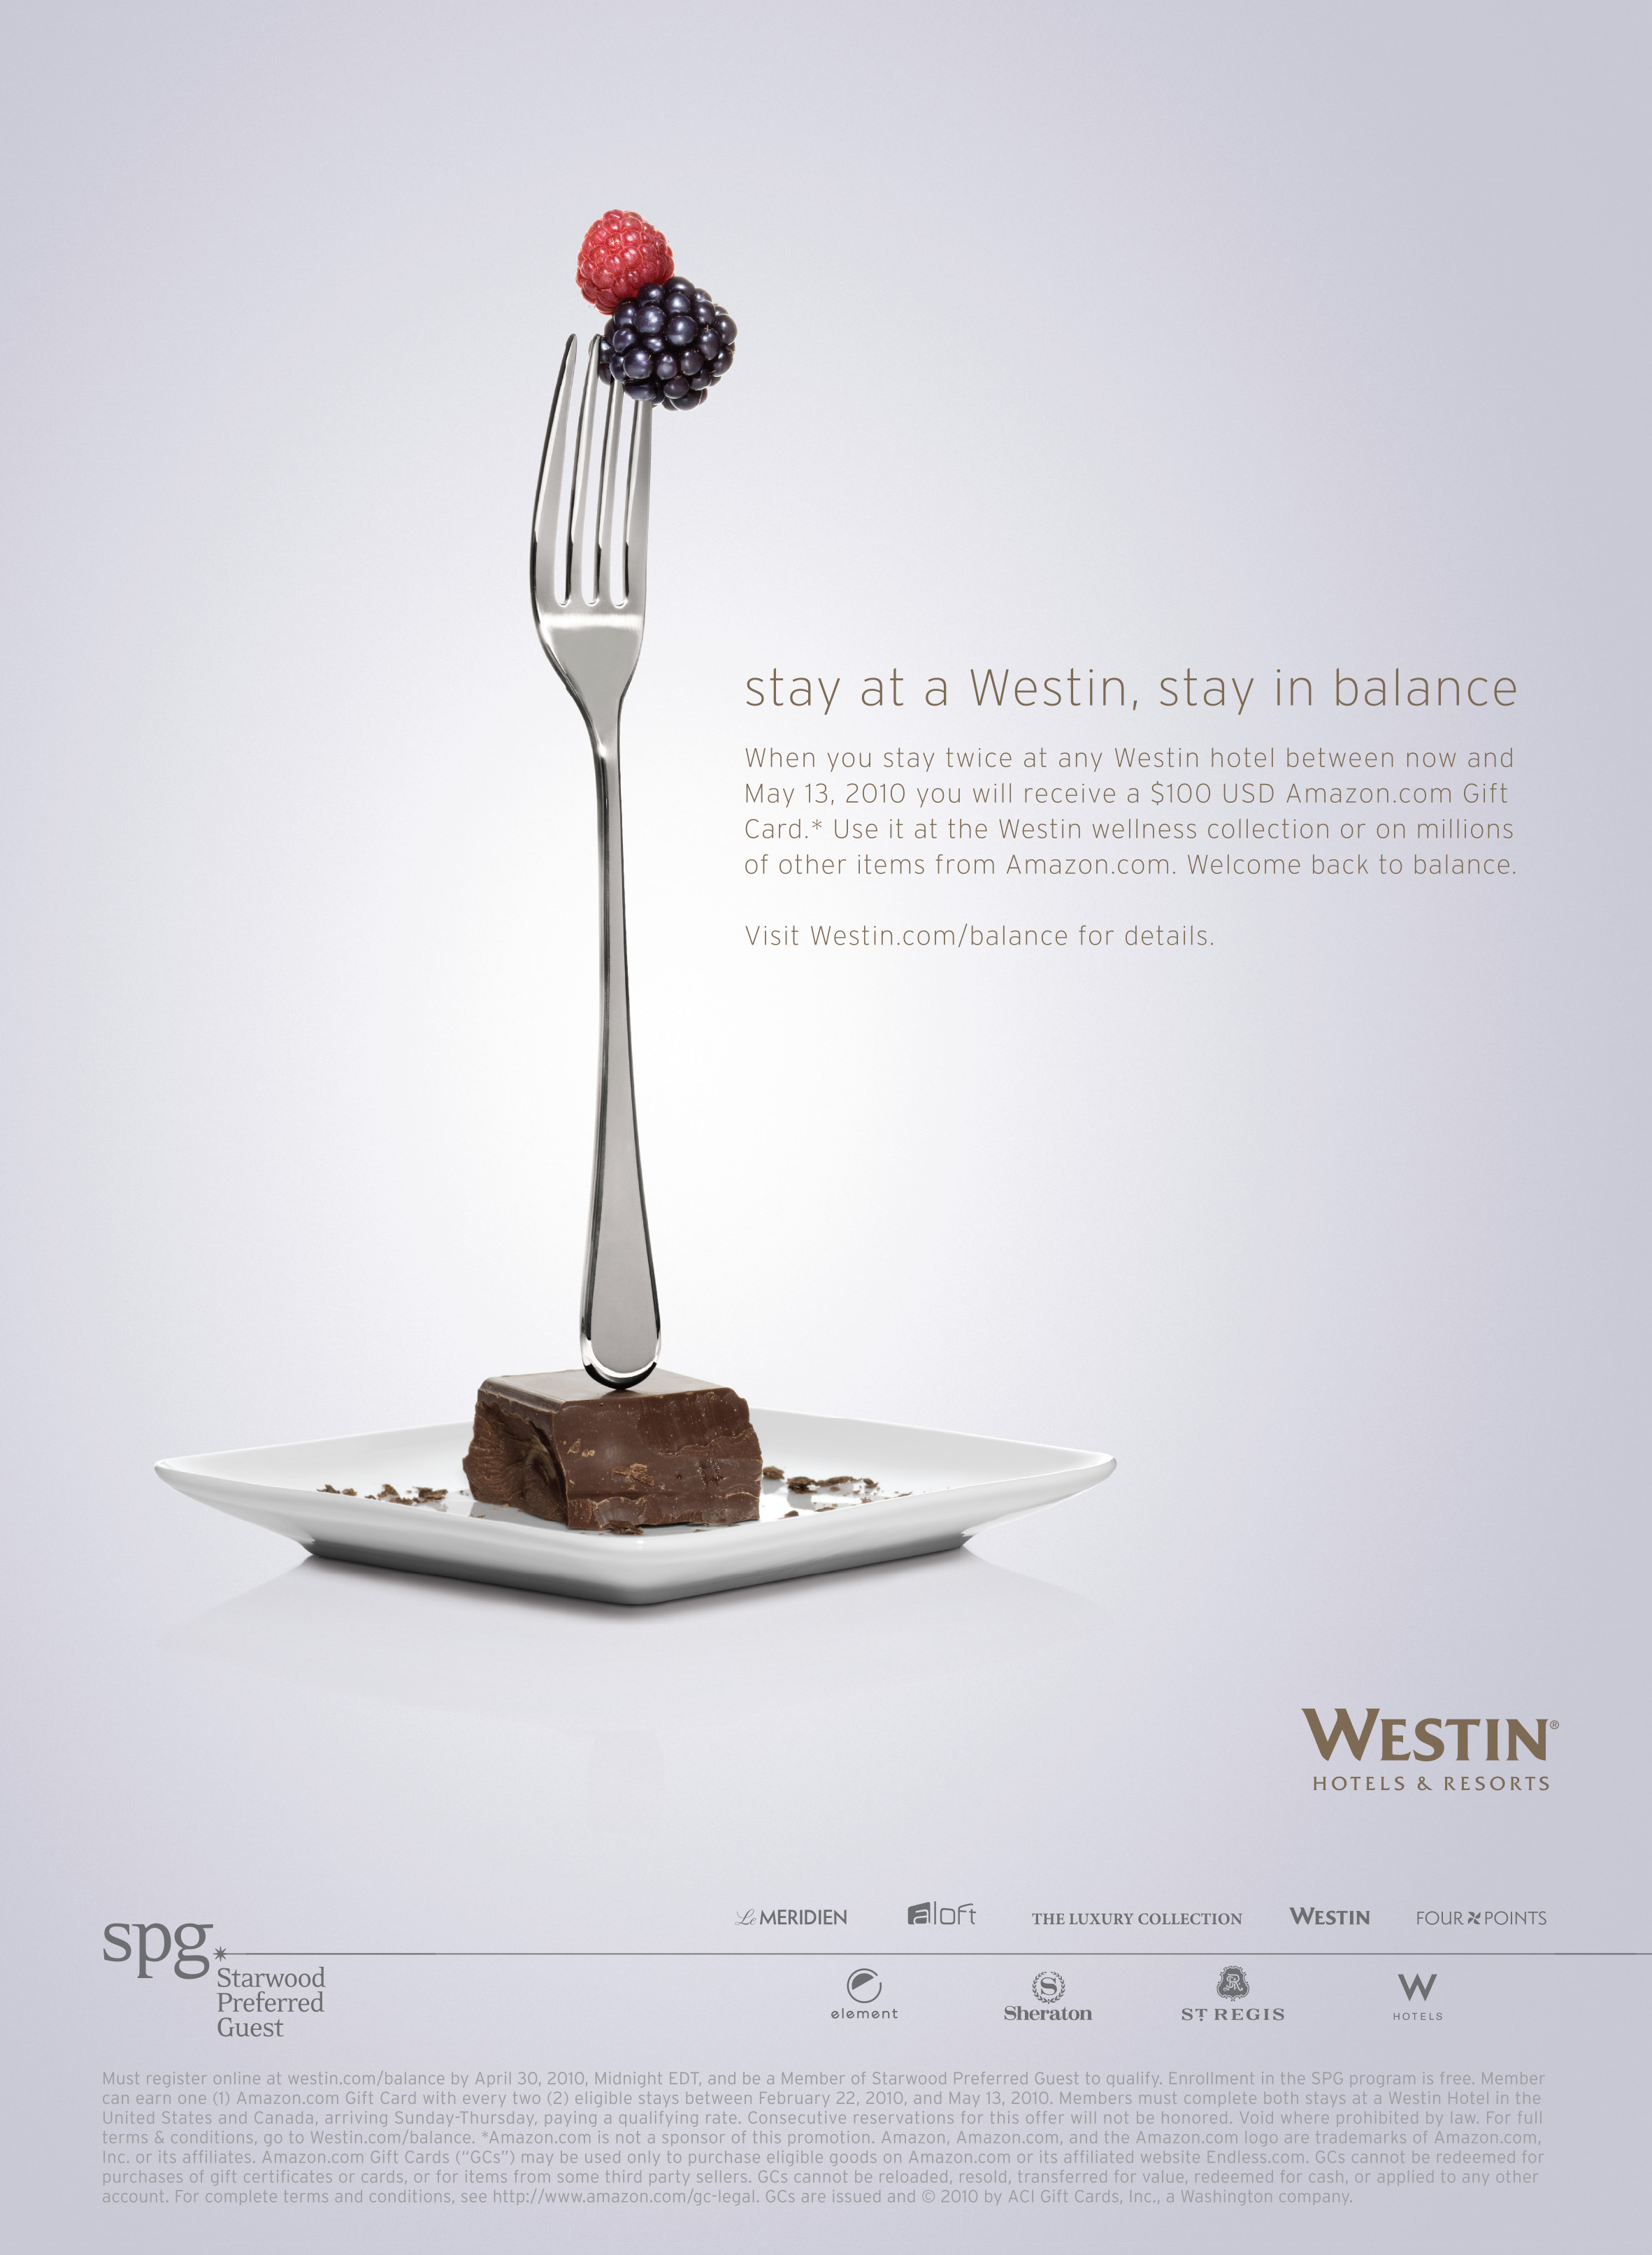 Starwood - Westin Hotels & Resorts :: Balance